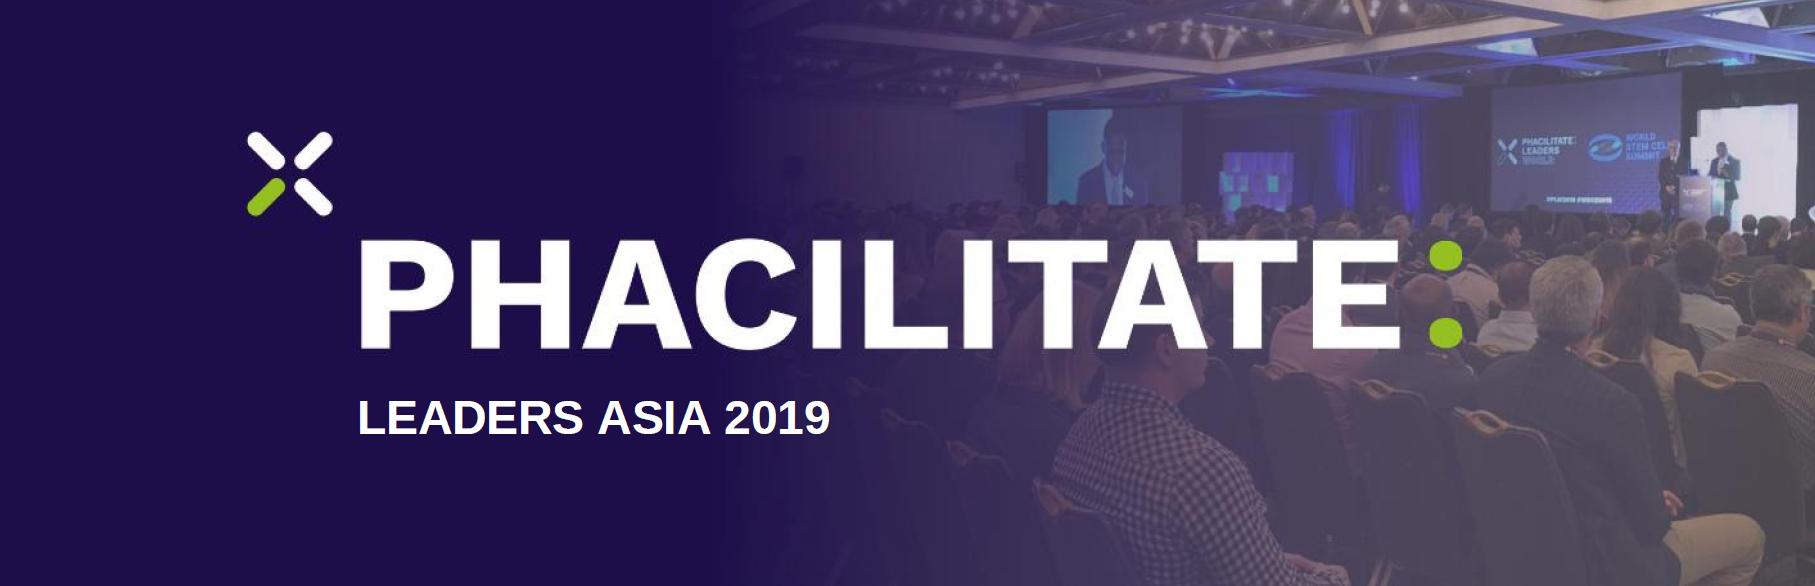 banner phacilitate asia 2019